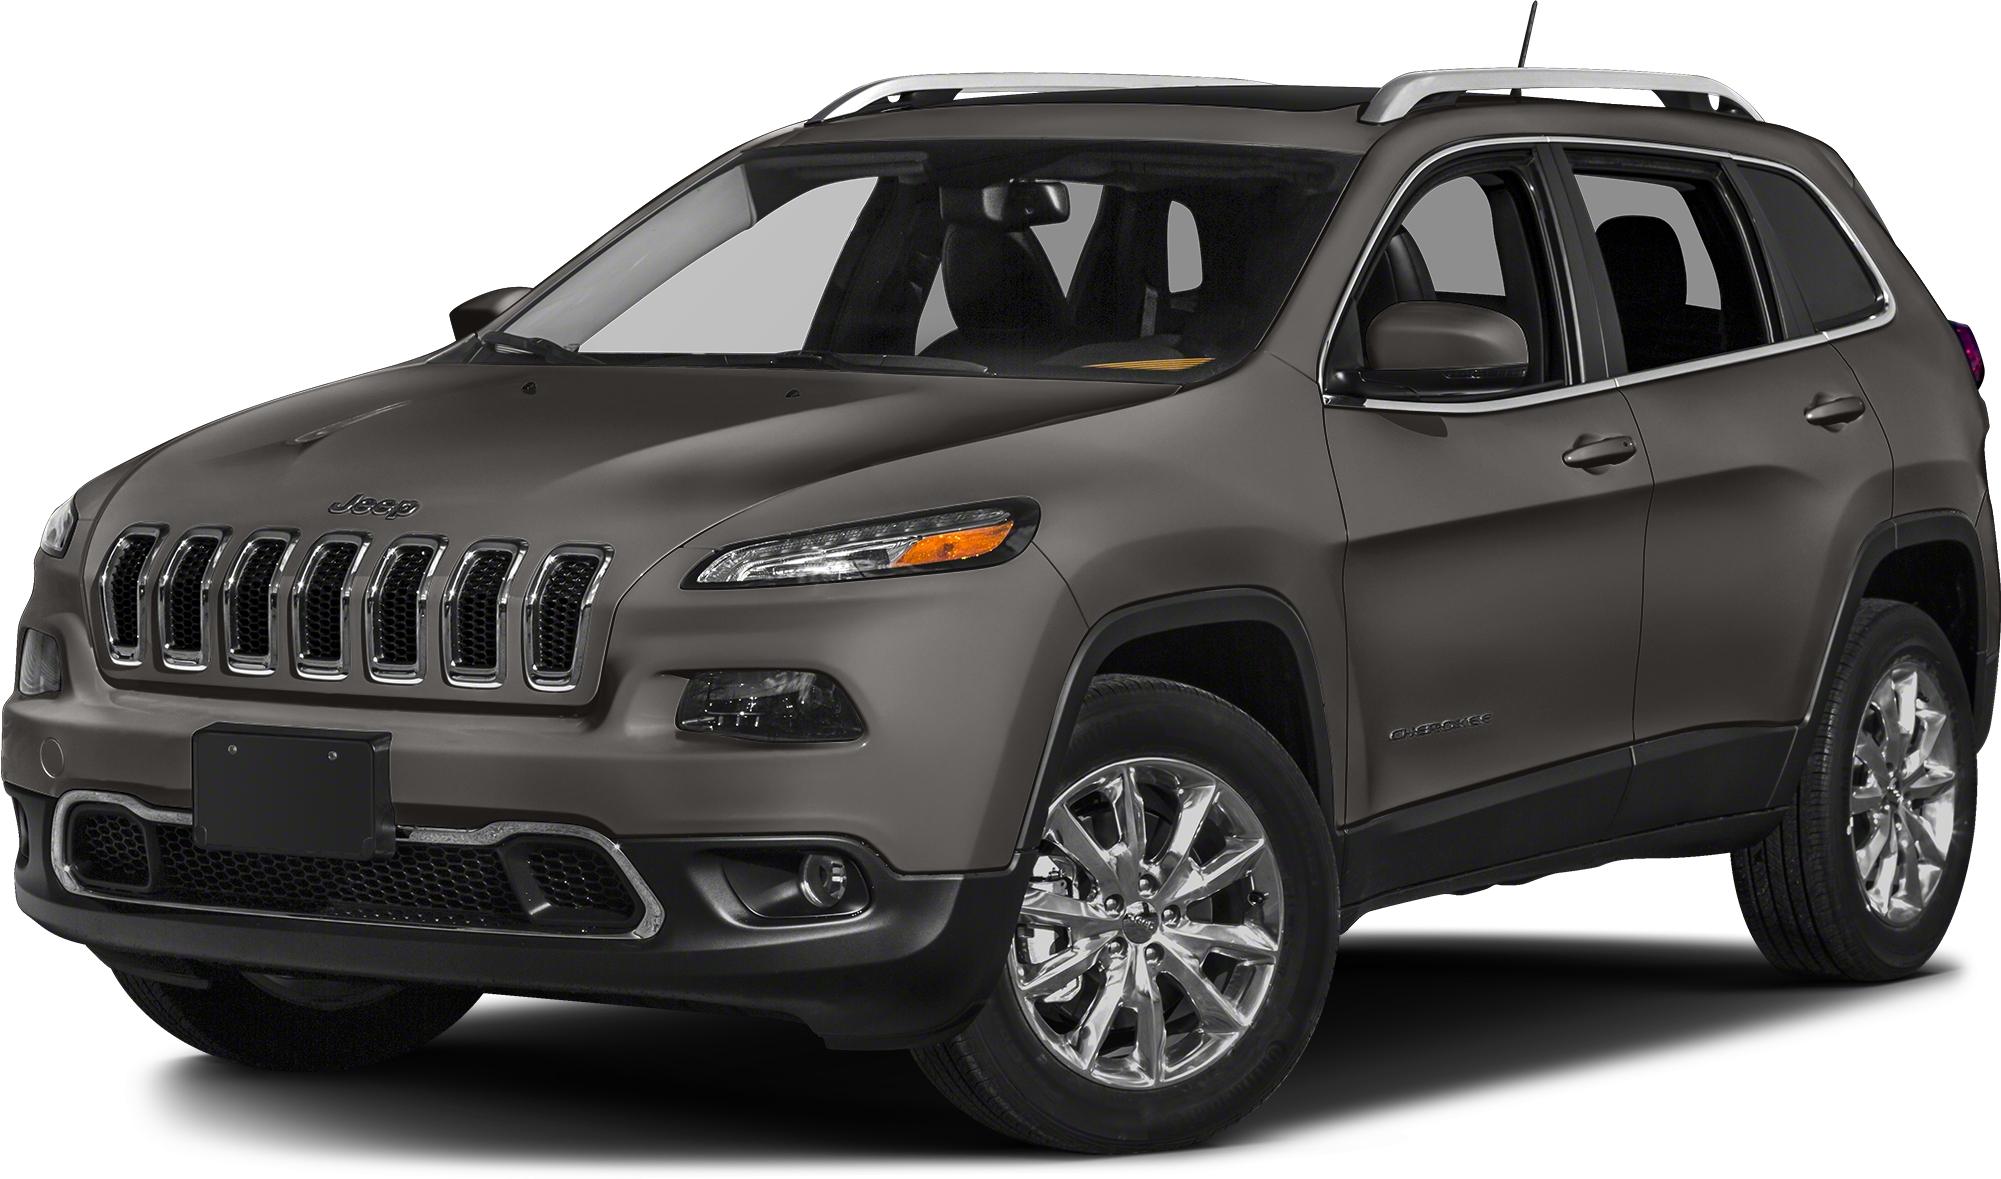 2015 jeep cherokee service manual pdf